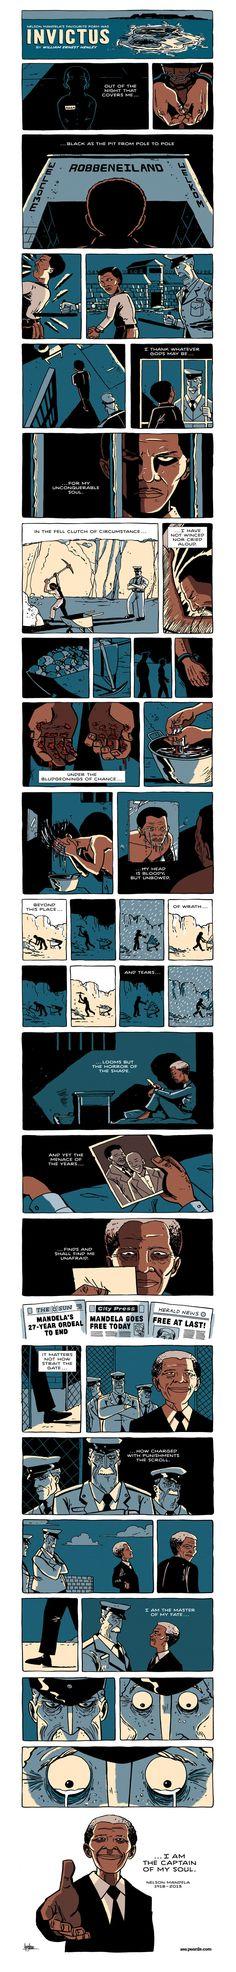 a comic tribute to nelson mandela